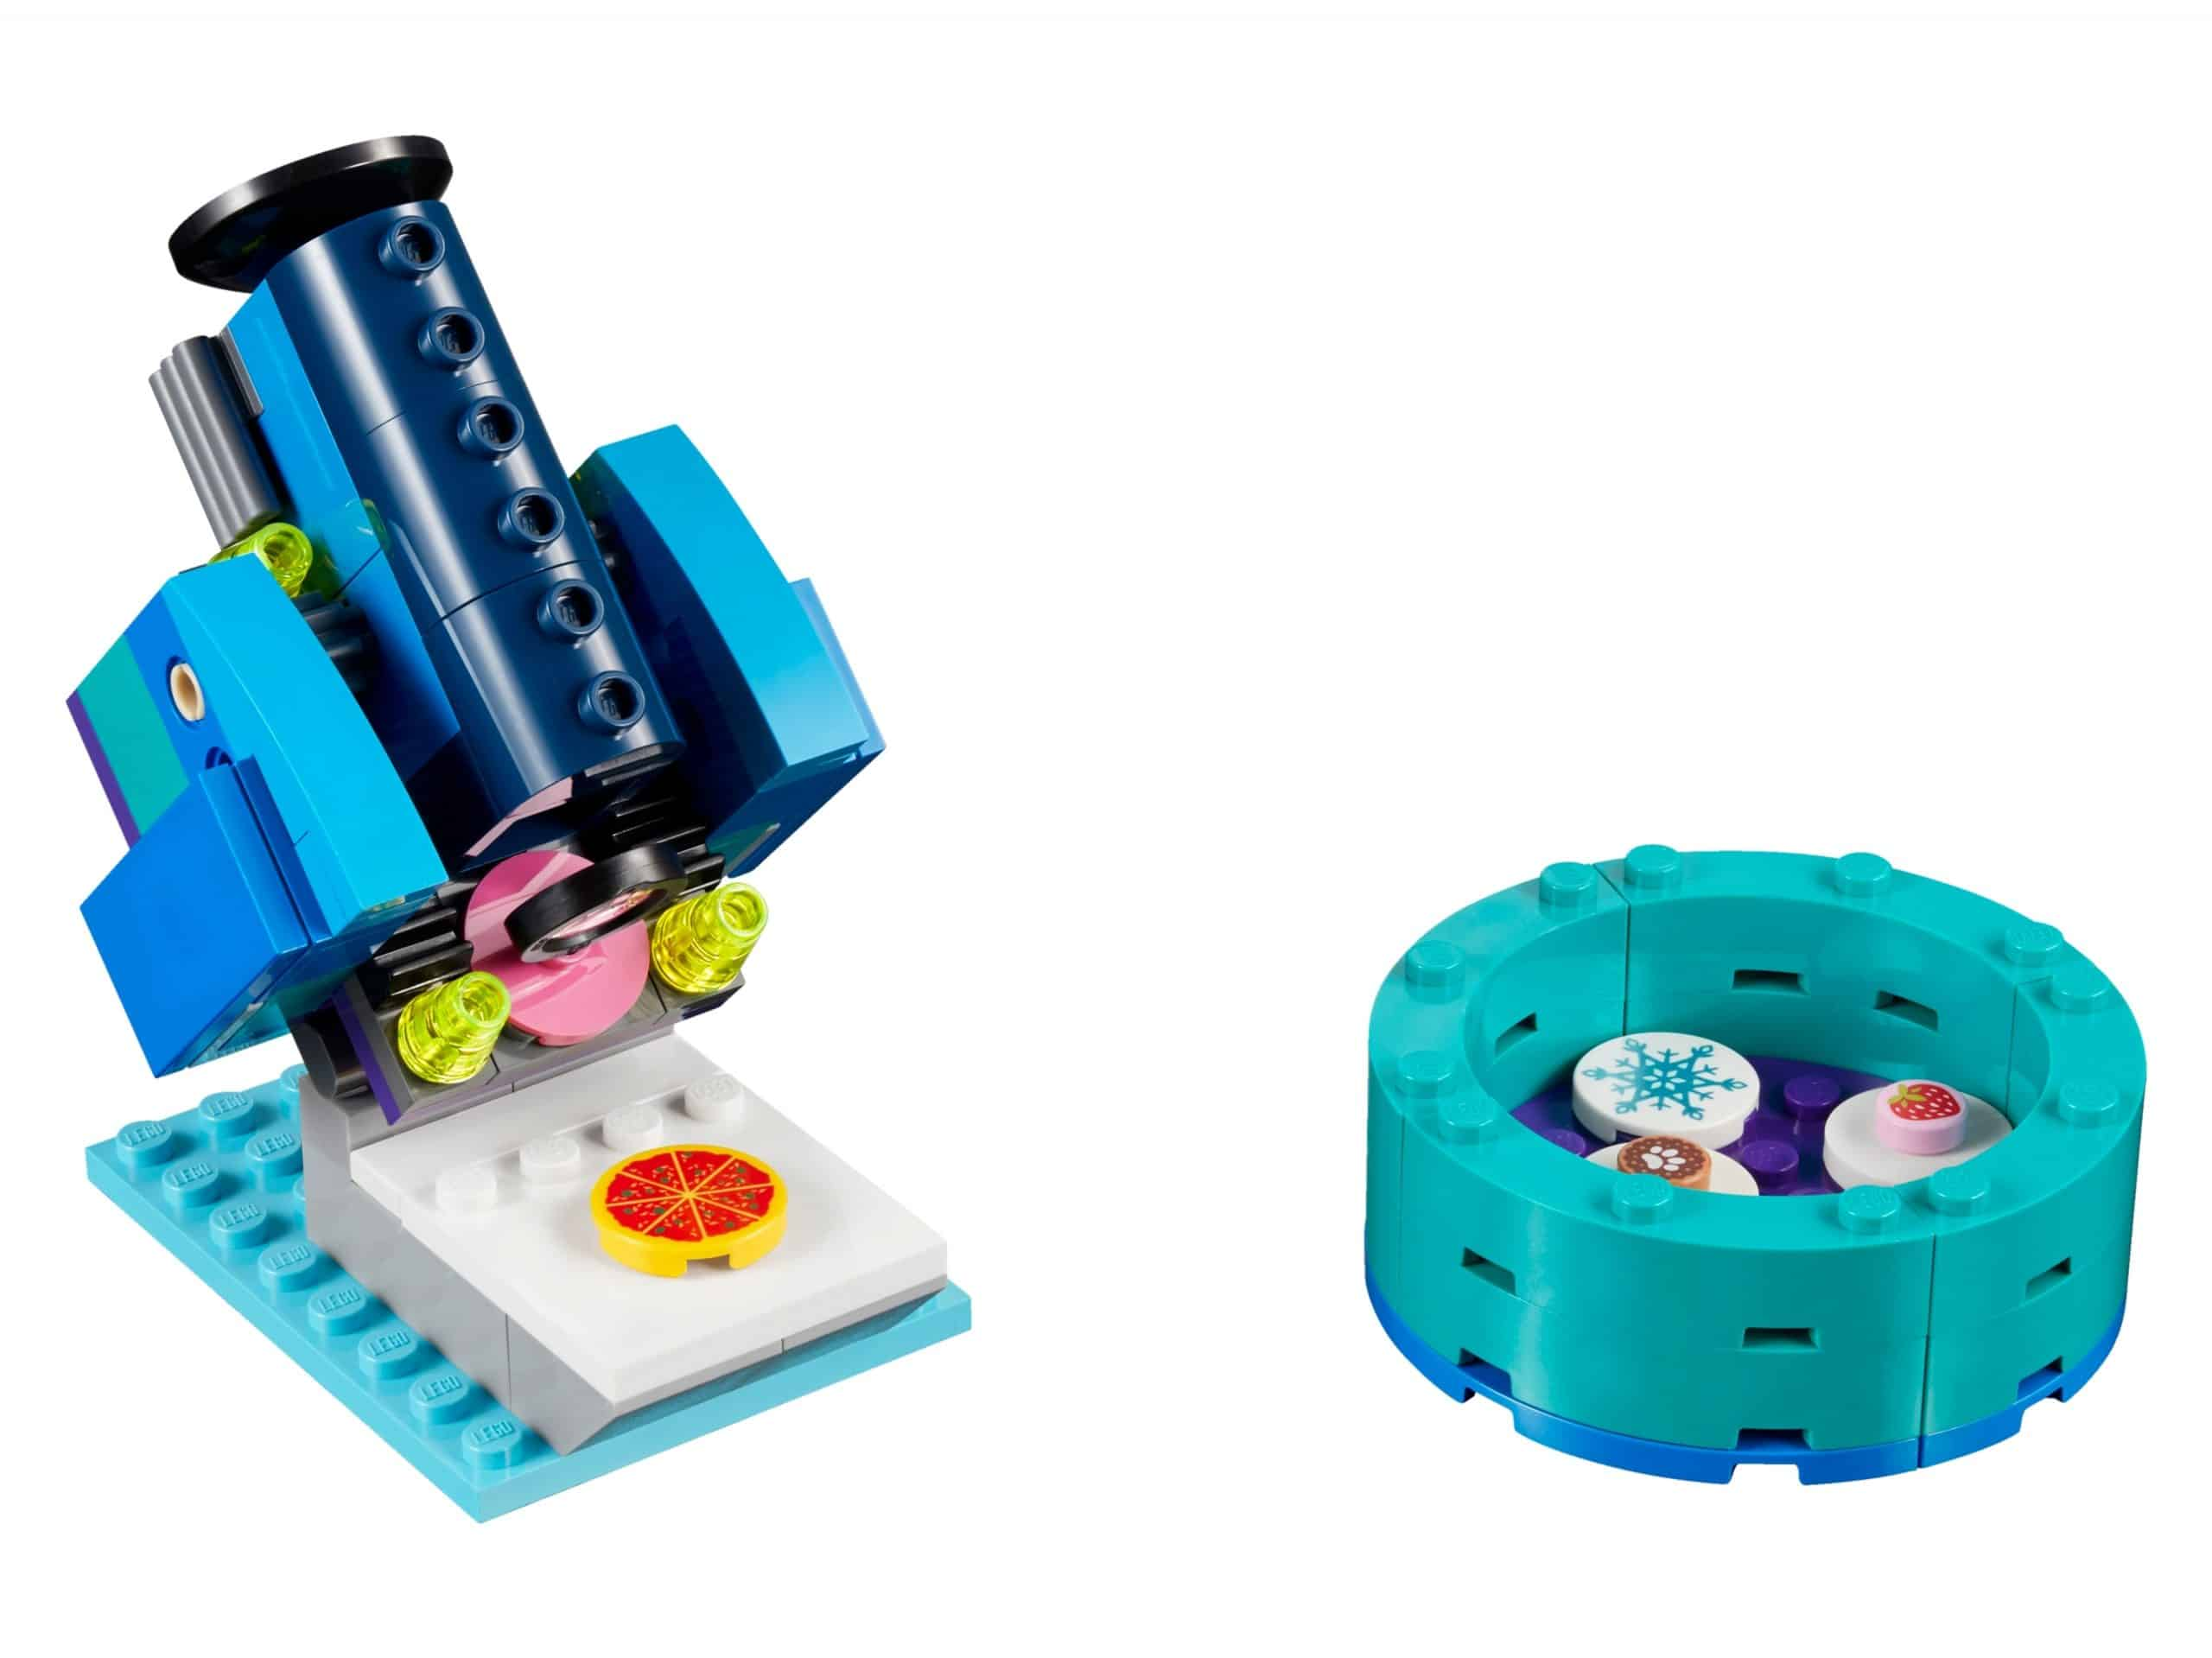 lego 40314 dr fuchs vergroserungsmaschine scaled